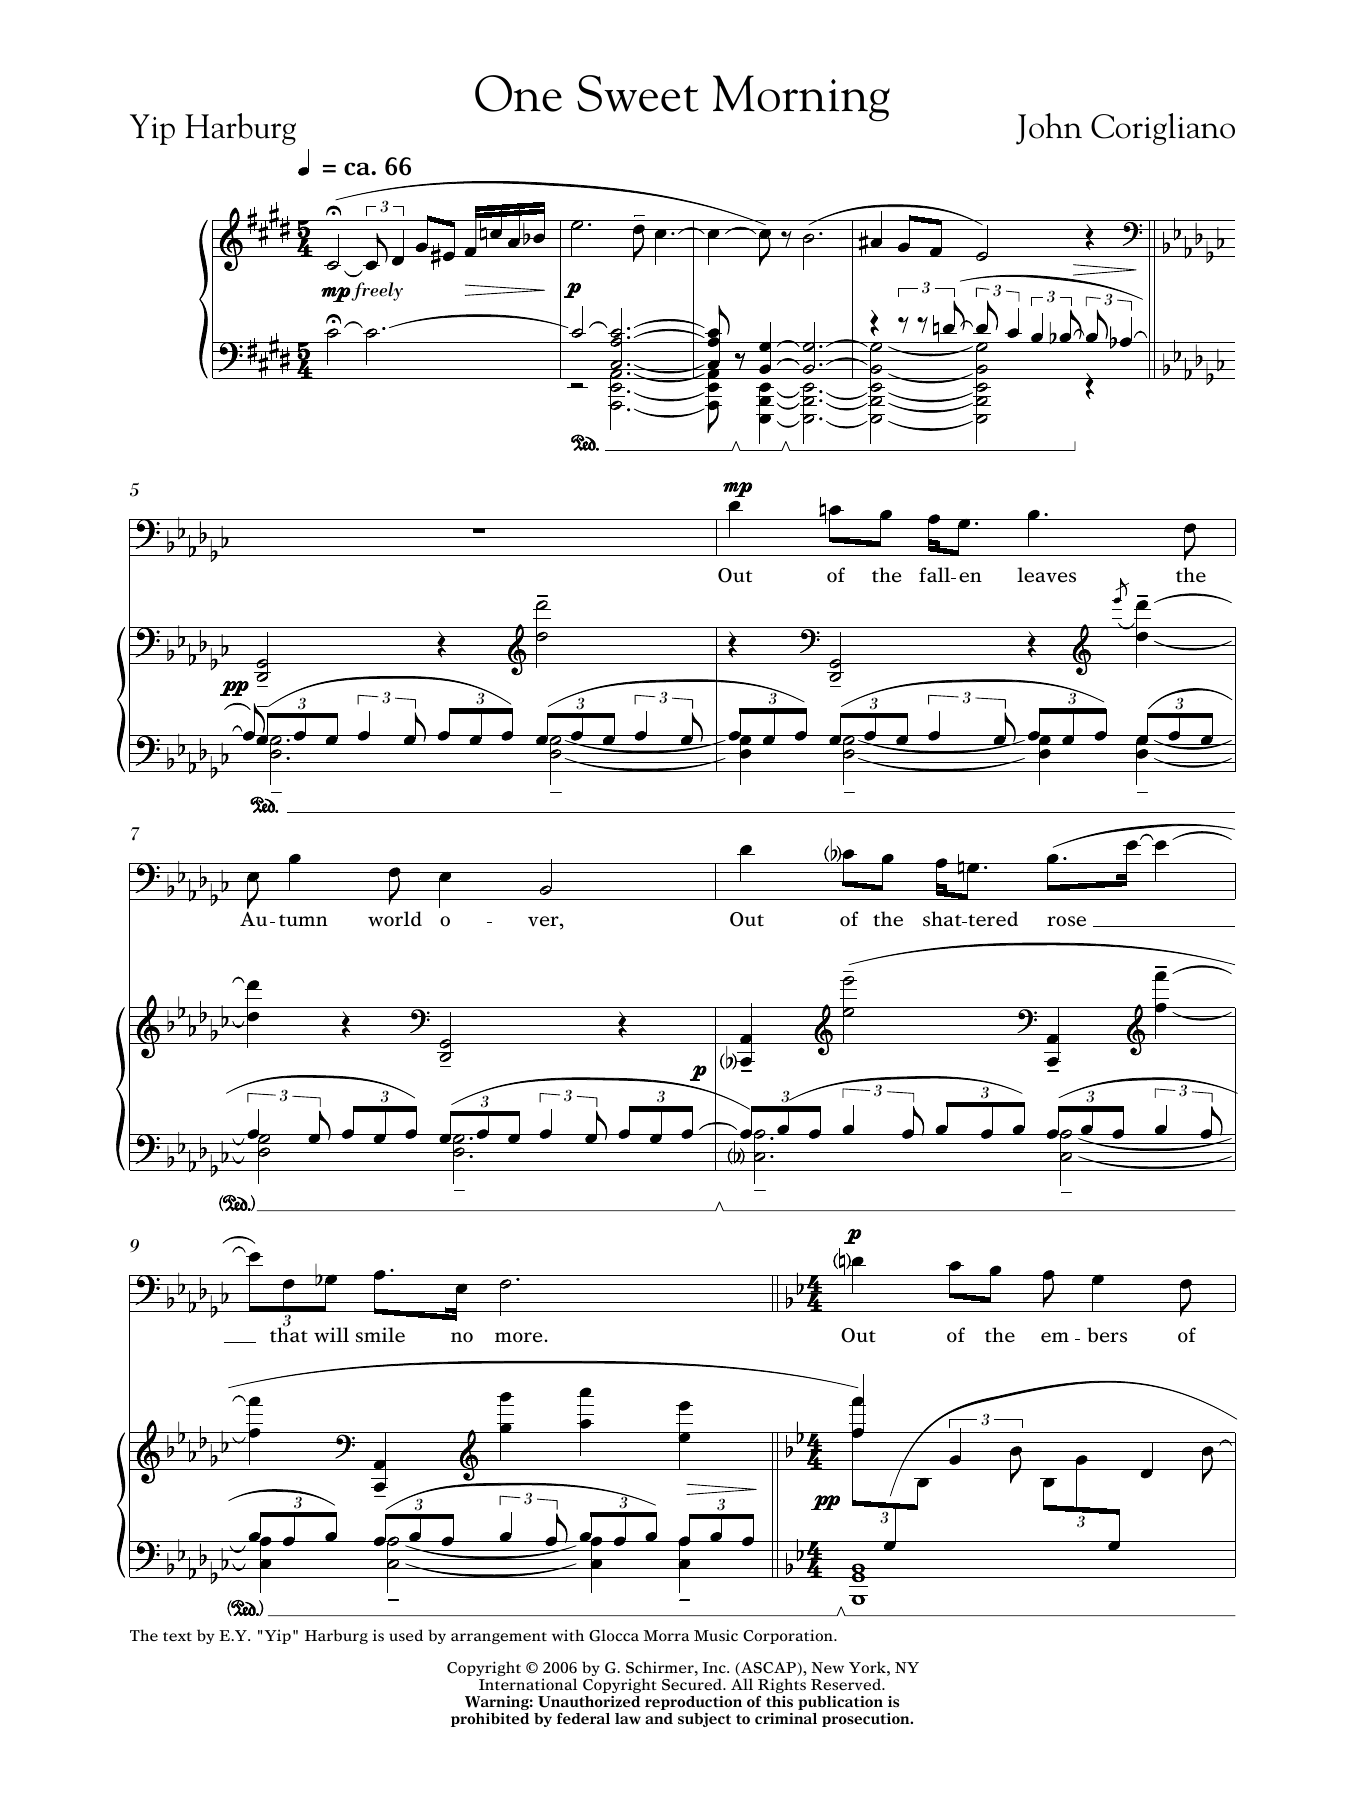 John Corigliano: One Sweet Morning (male voice)